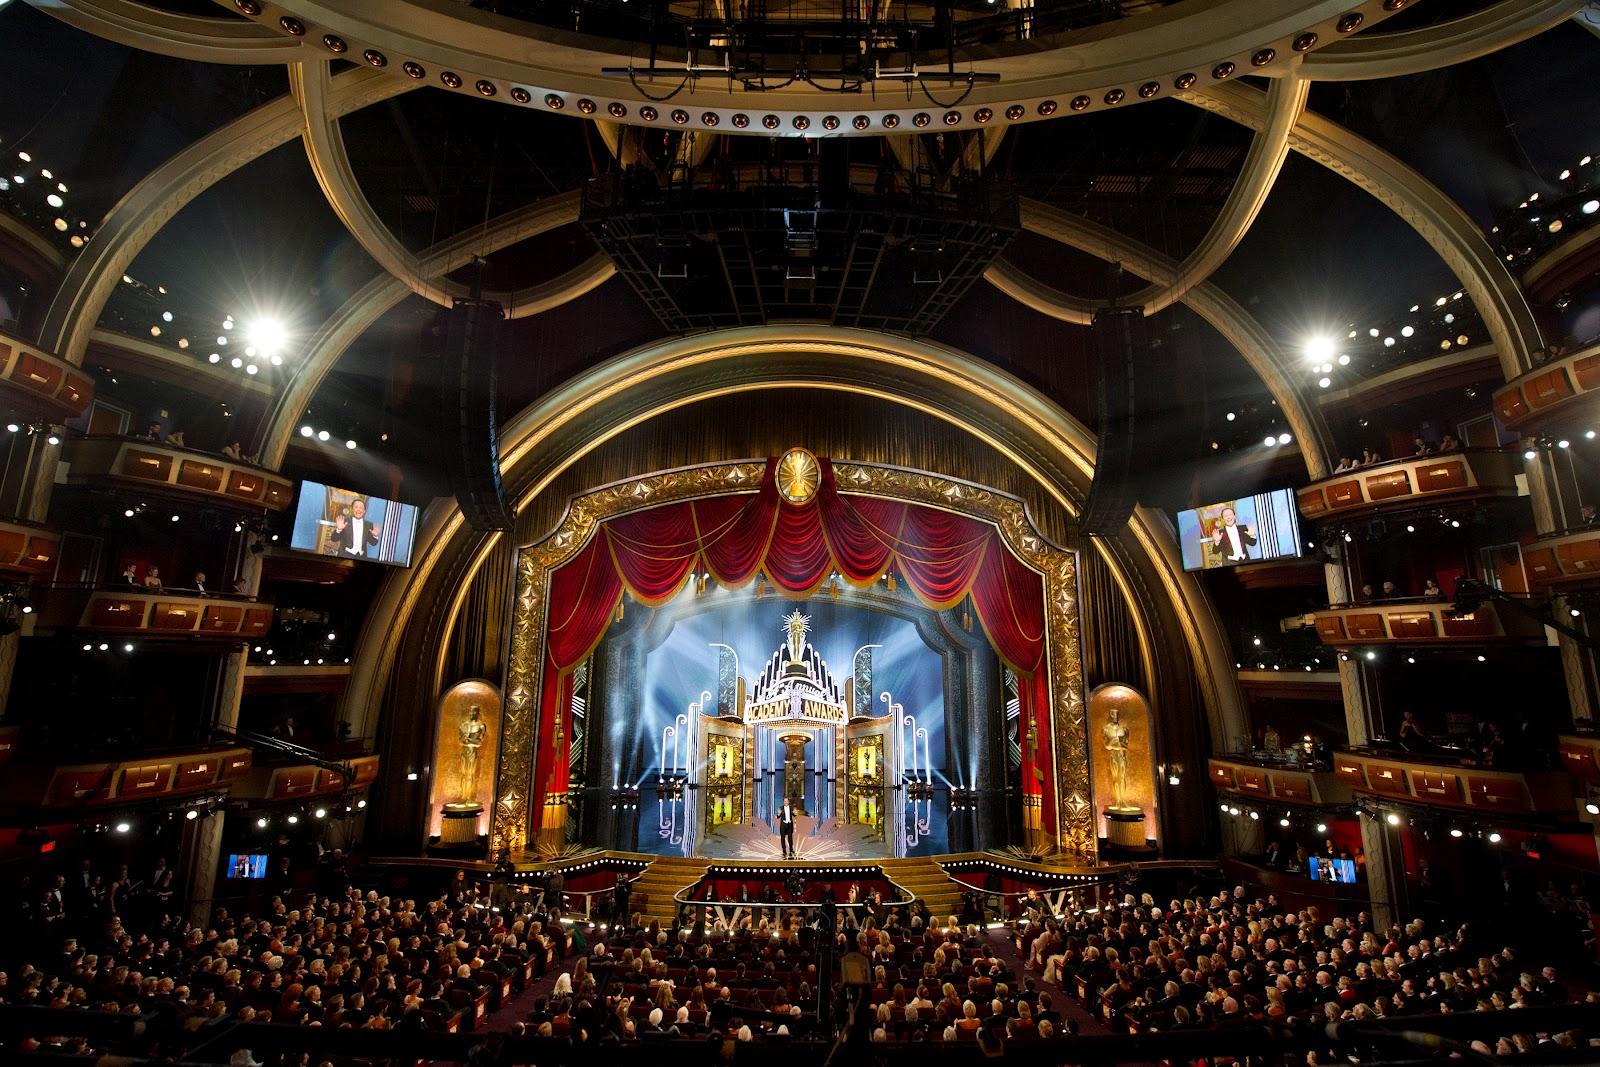 http://3.bp.blogspot.com/-mHQRJXTUHY0/T0sZr6qCvXI/AAAAAAAAGU4/6TgiAzg8Ums/s1600/84th_Academy_Awards_stage.jpg